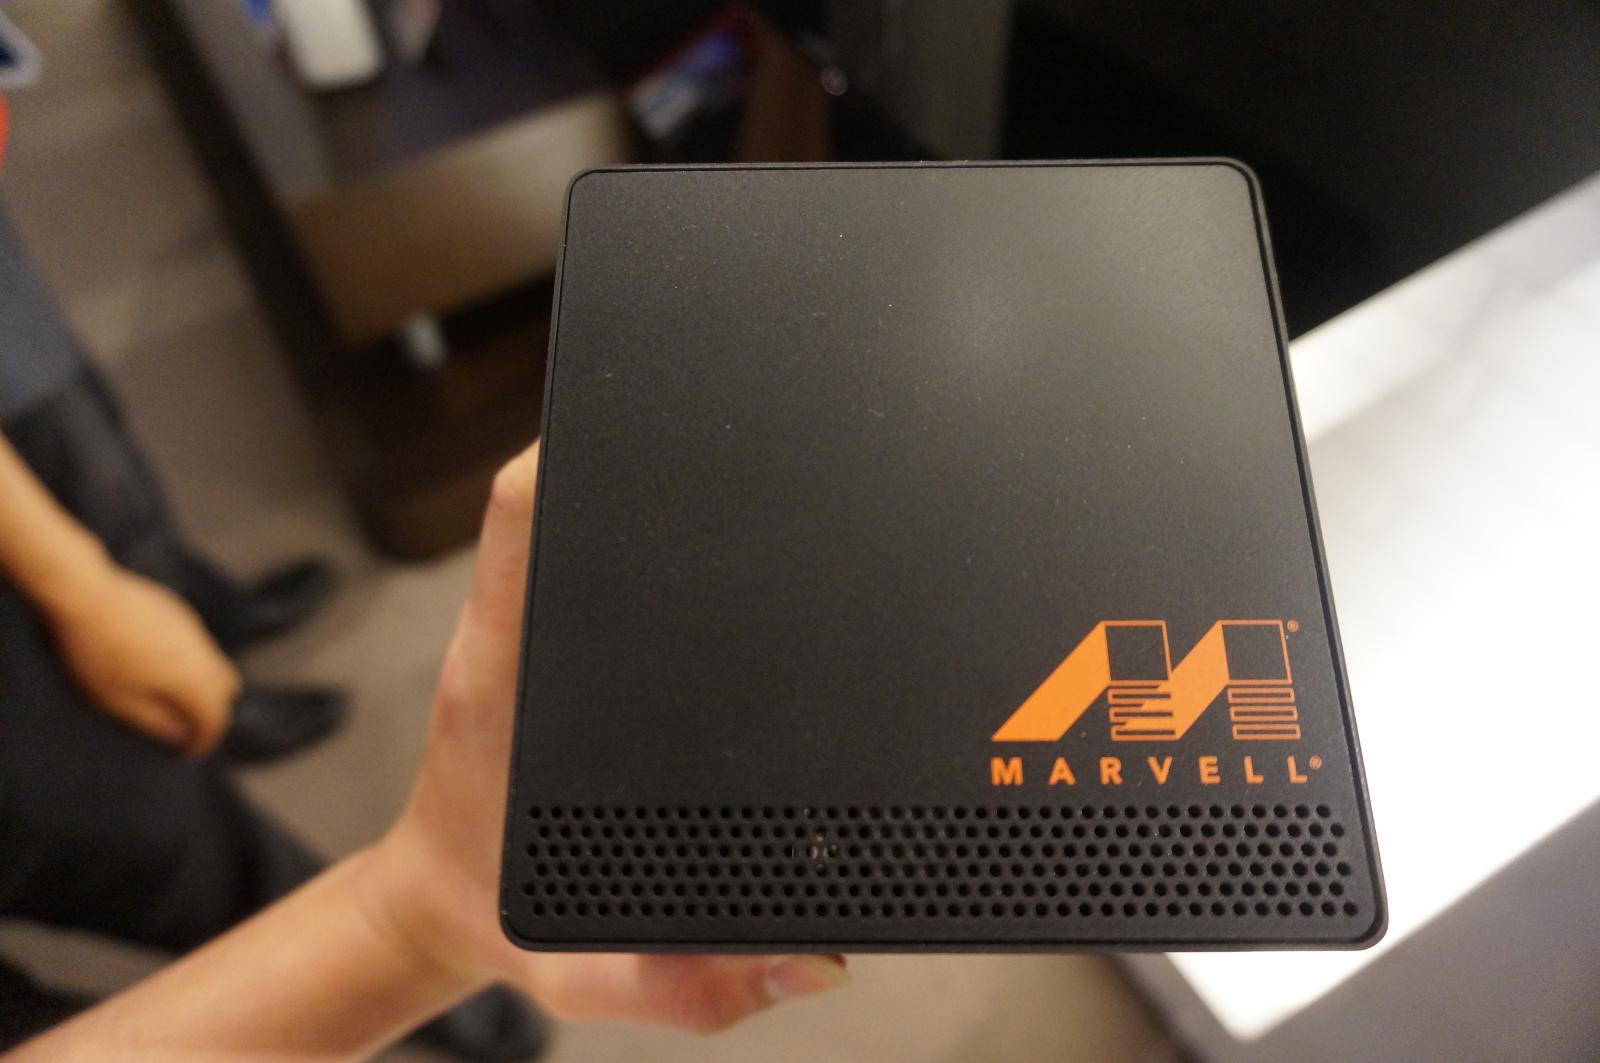 Marvell-IoT-20150603-3